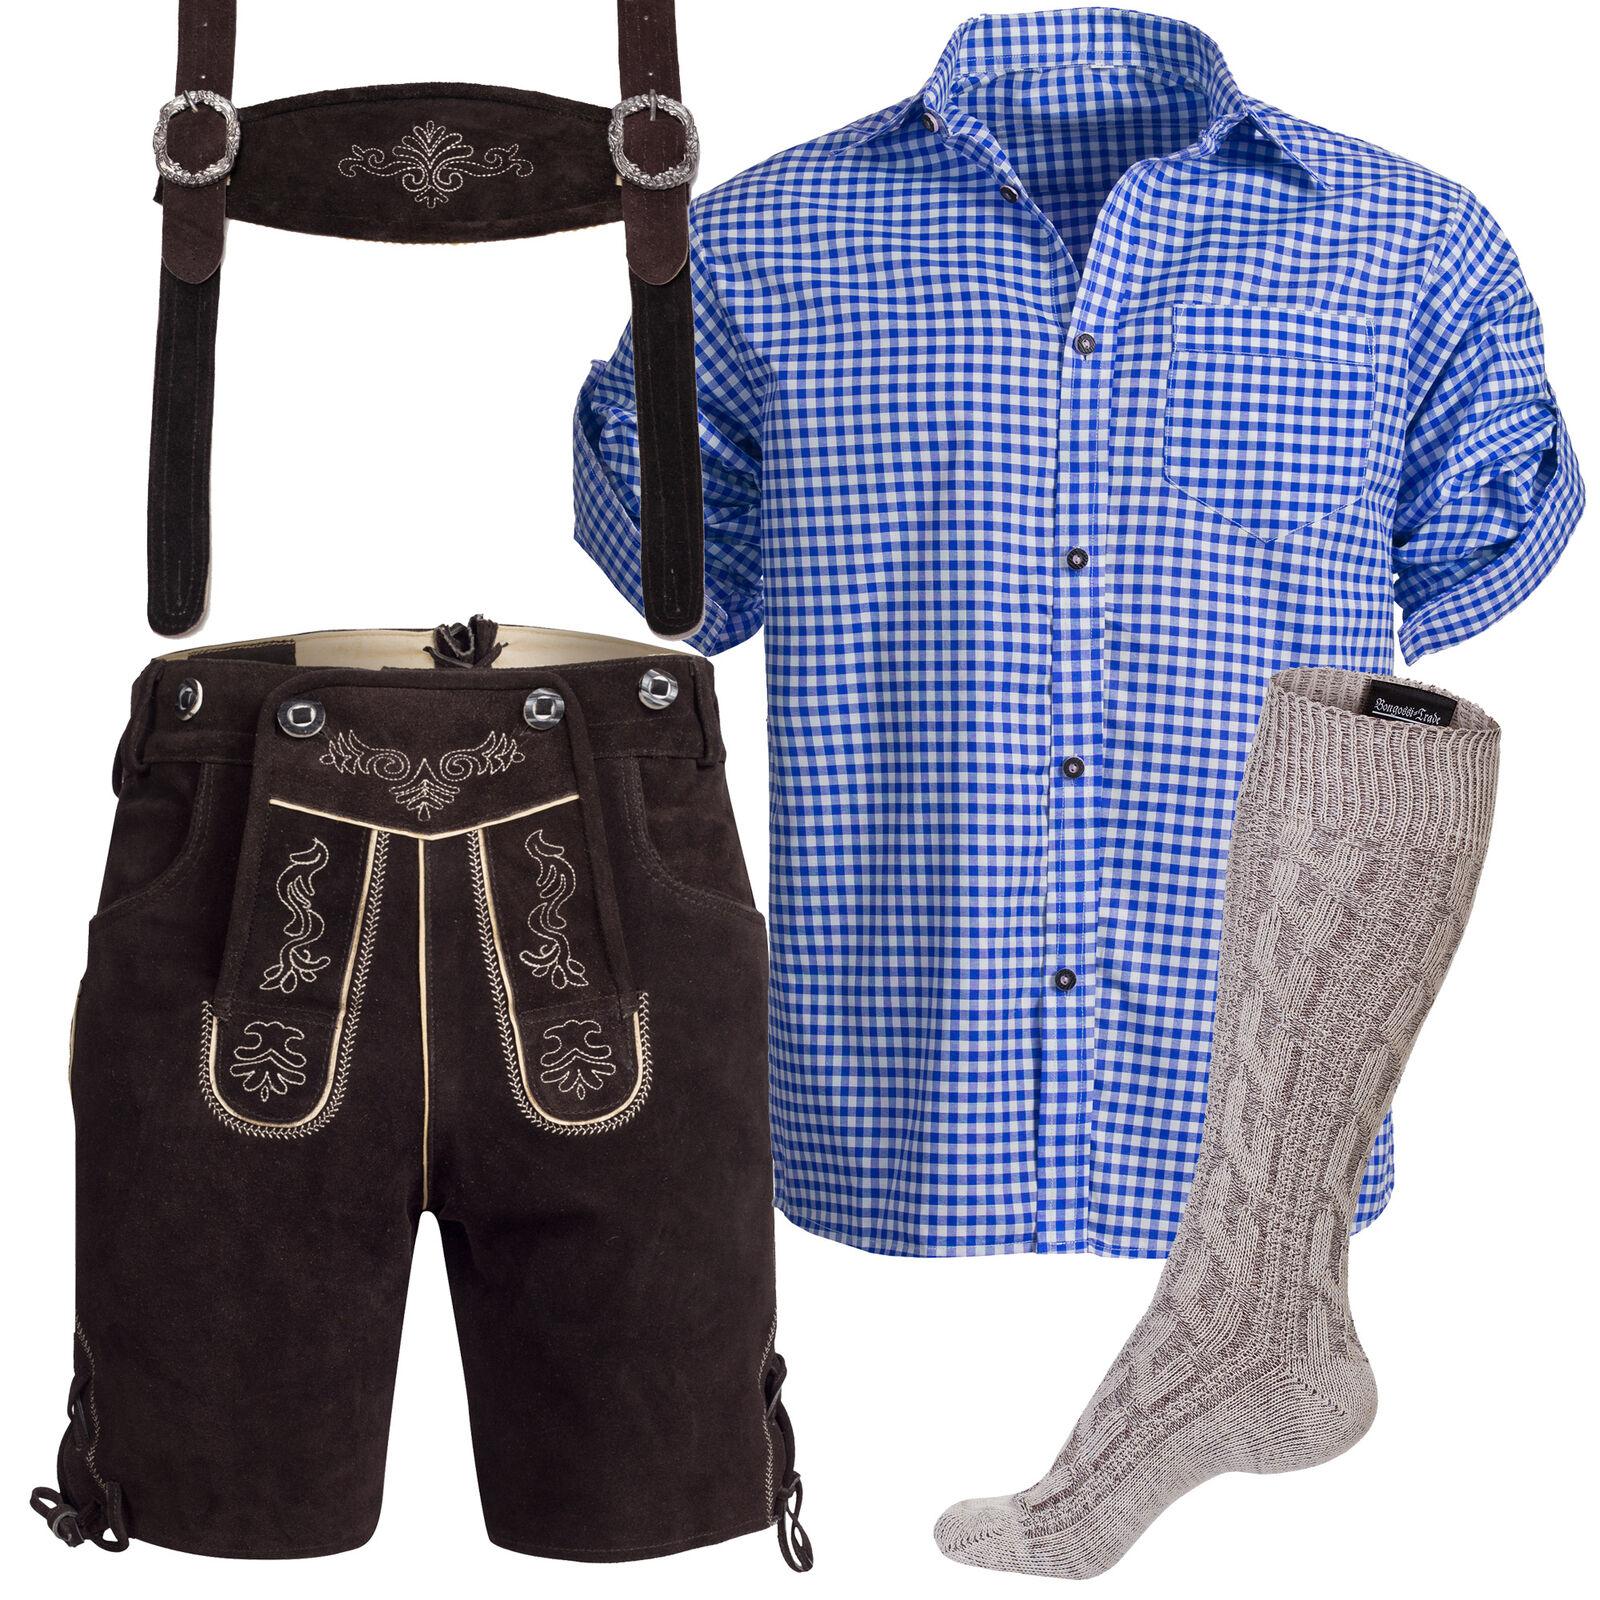 Trachtenlederhose Bundhose kurz m.Trägern dunkelbraun+ Trachtenhemd blau+ Socken